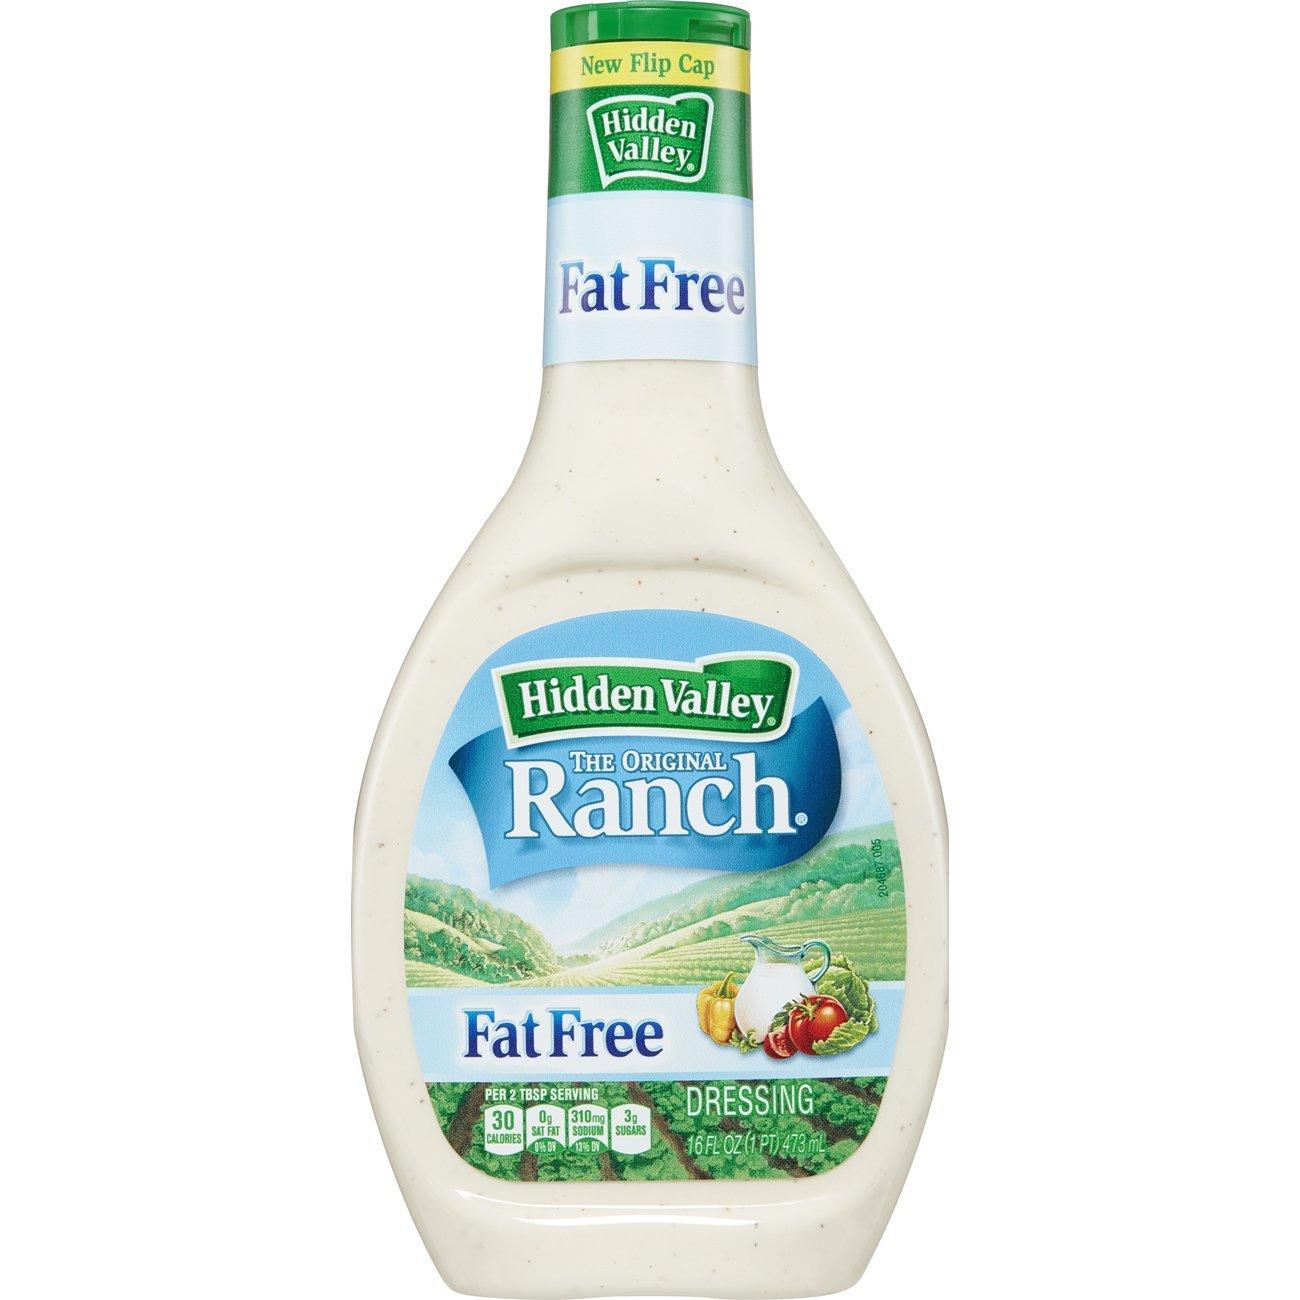 Hidden Valley Original Ranch Fat Free Salad Dressing & Topping, Gluten Free - 16 Ounce Bottle - Pack of 6